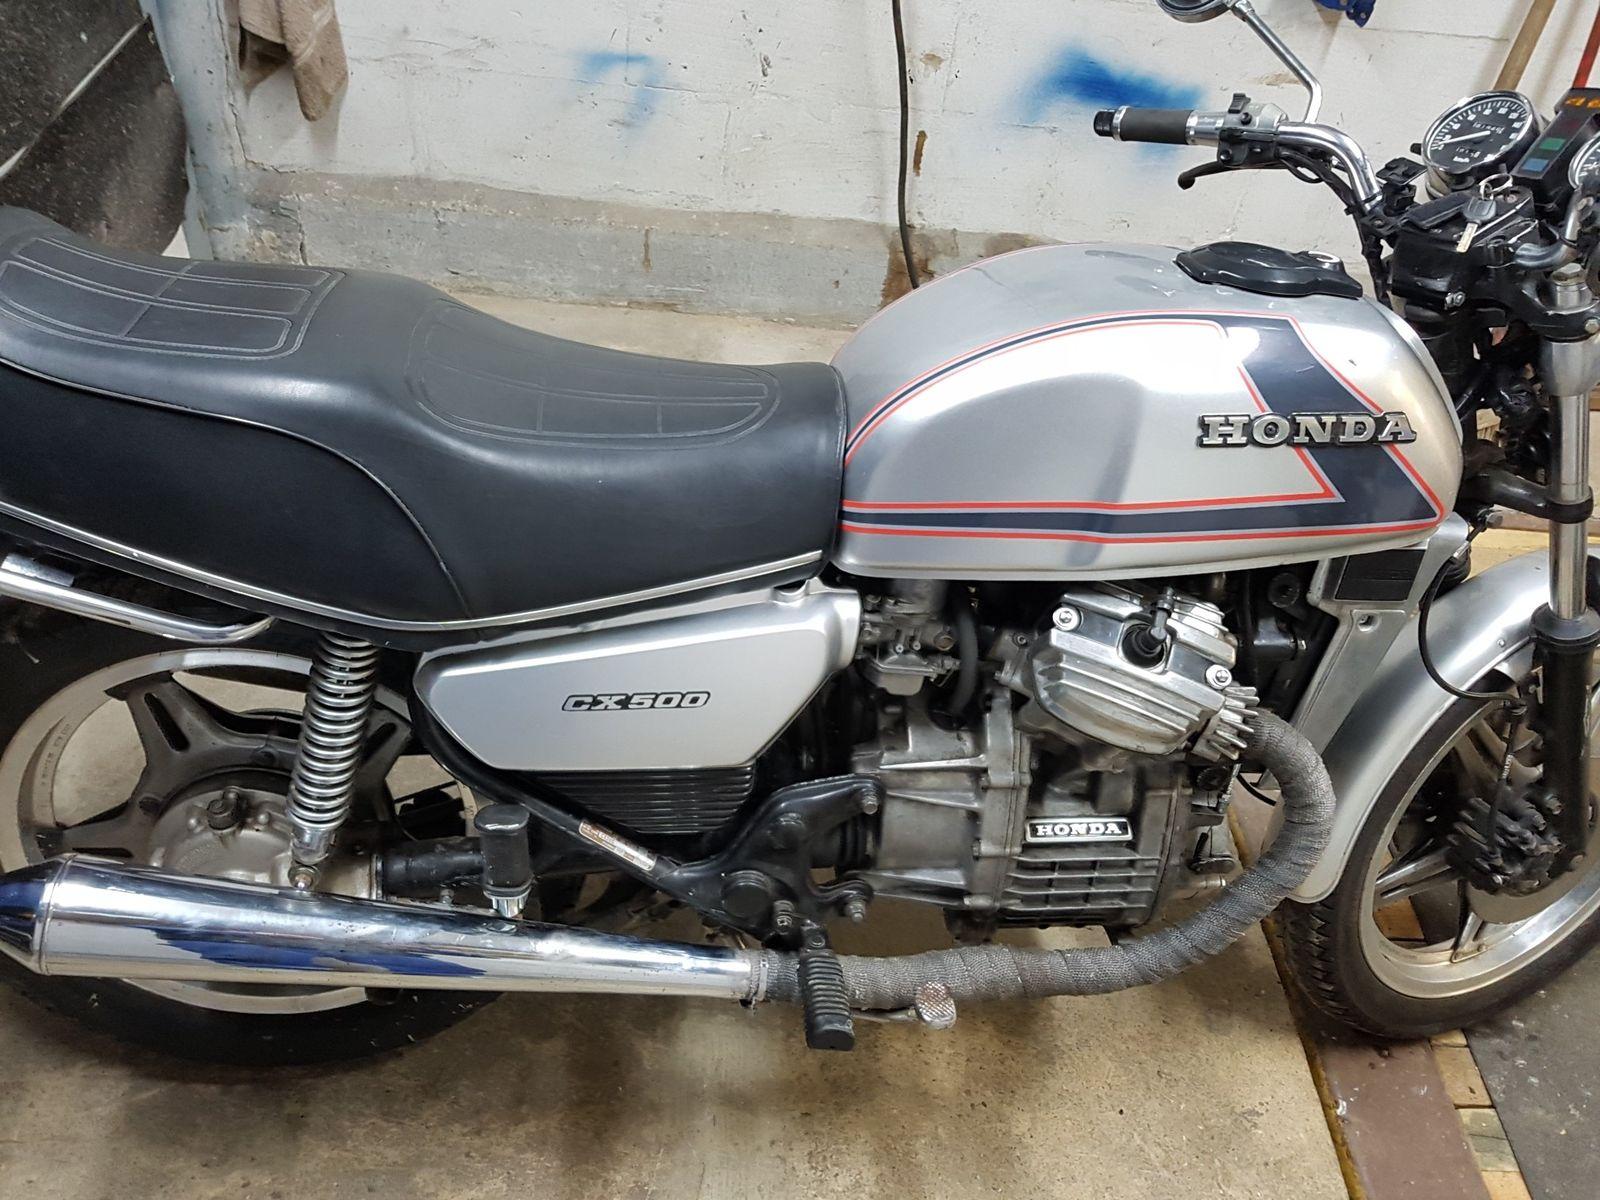 Покупка, внос на мотор от Германия Honda CX 500 кубика, 50 к.с. (2)